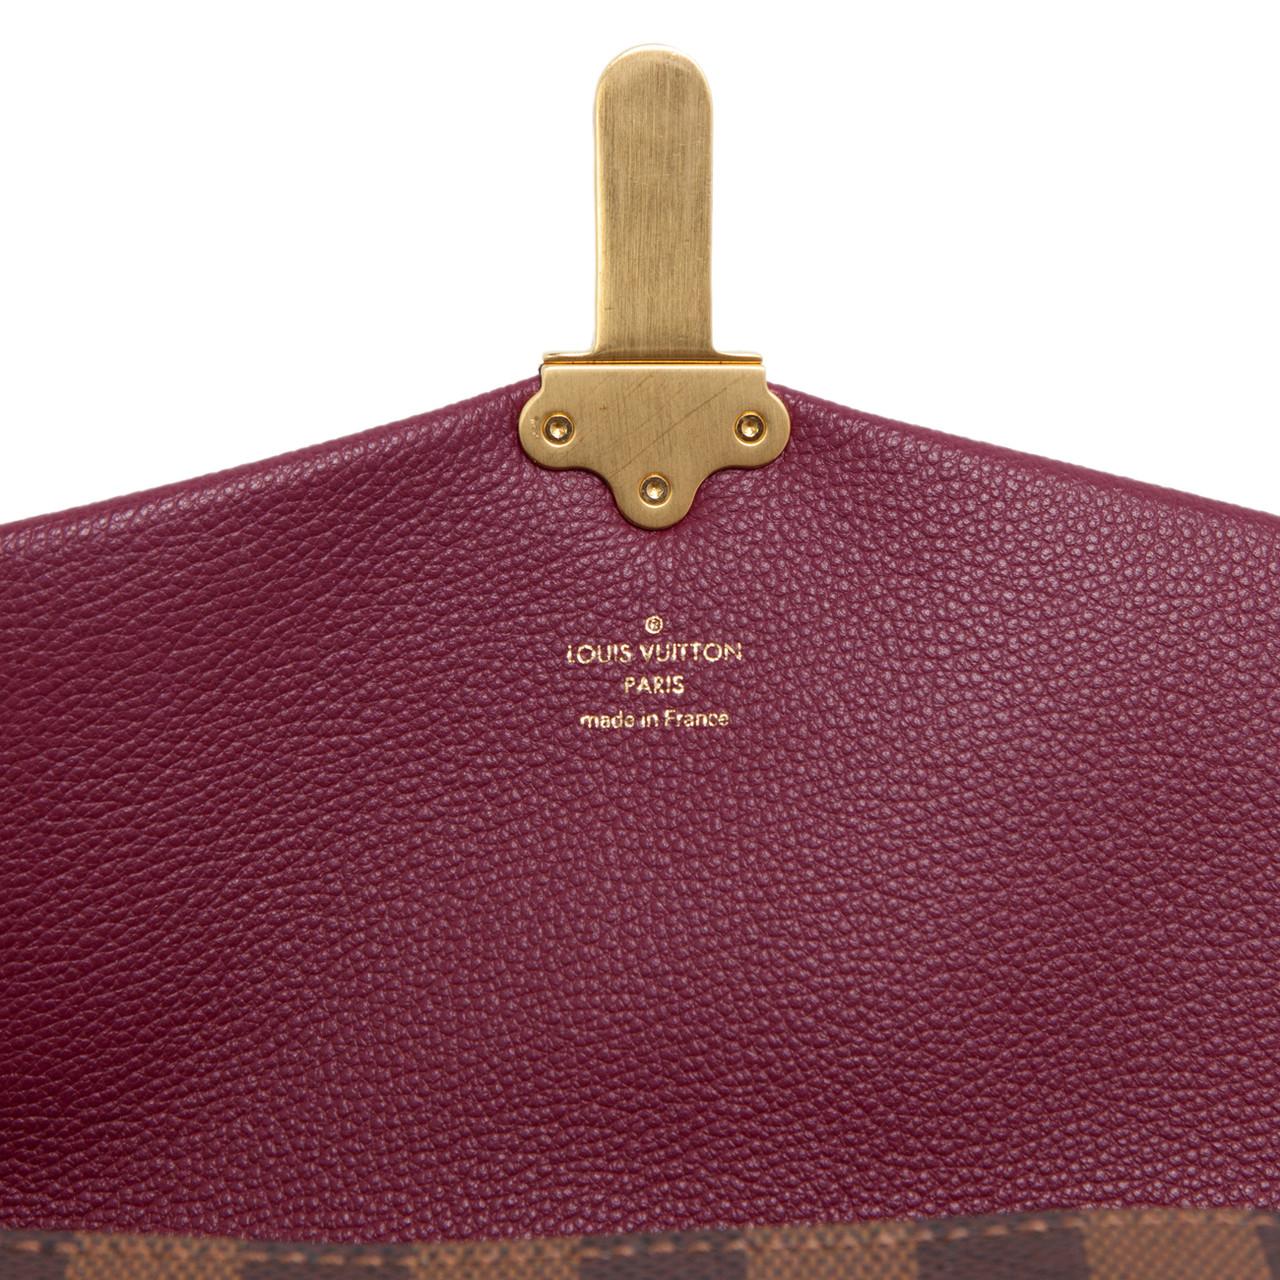 745248c79 Louis Vuitton Damier Ebene Clapton PM - modaselle